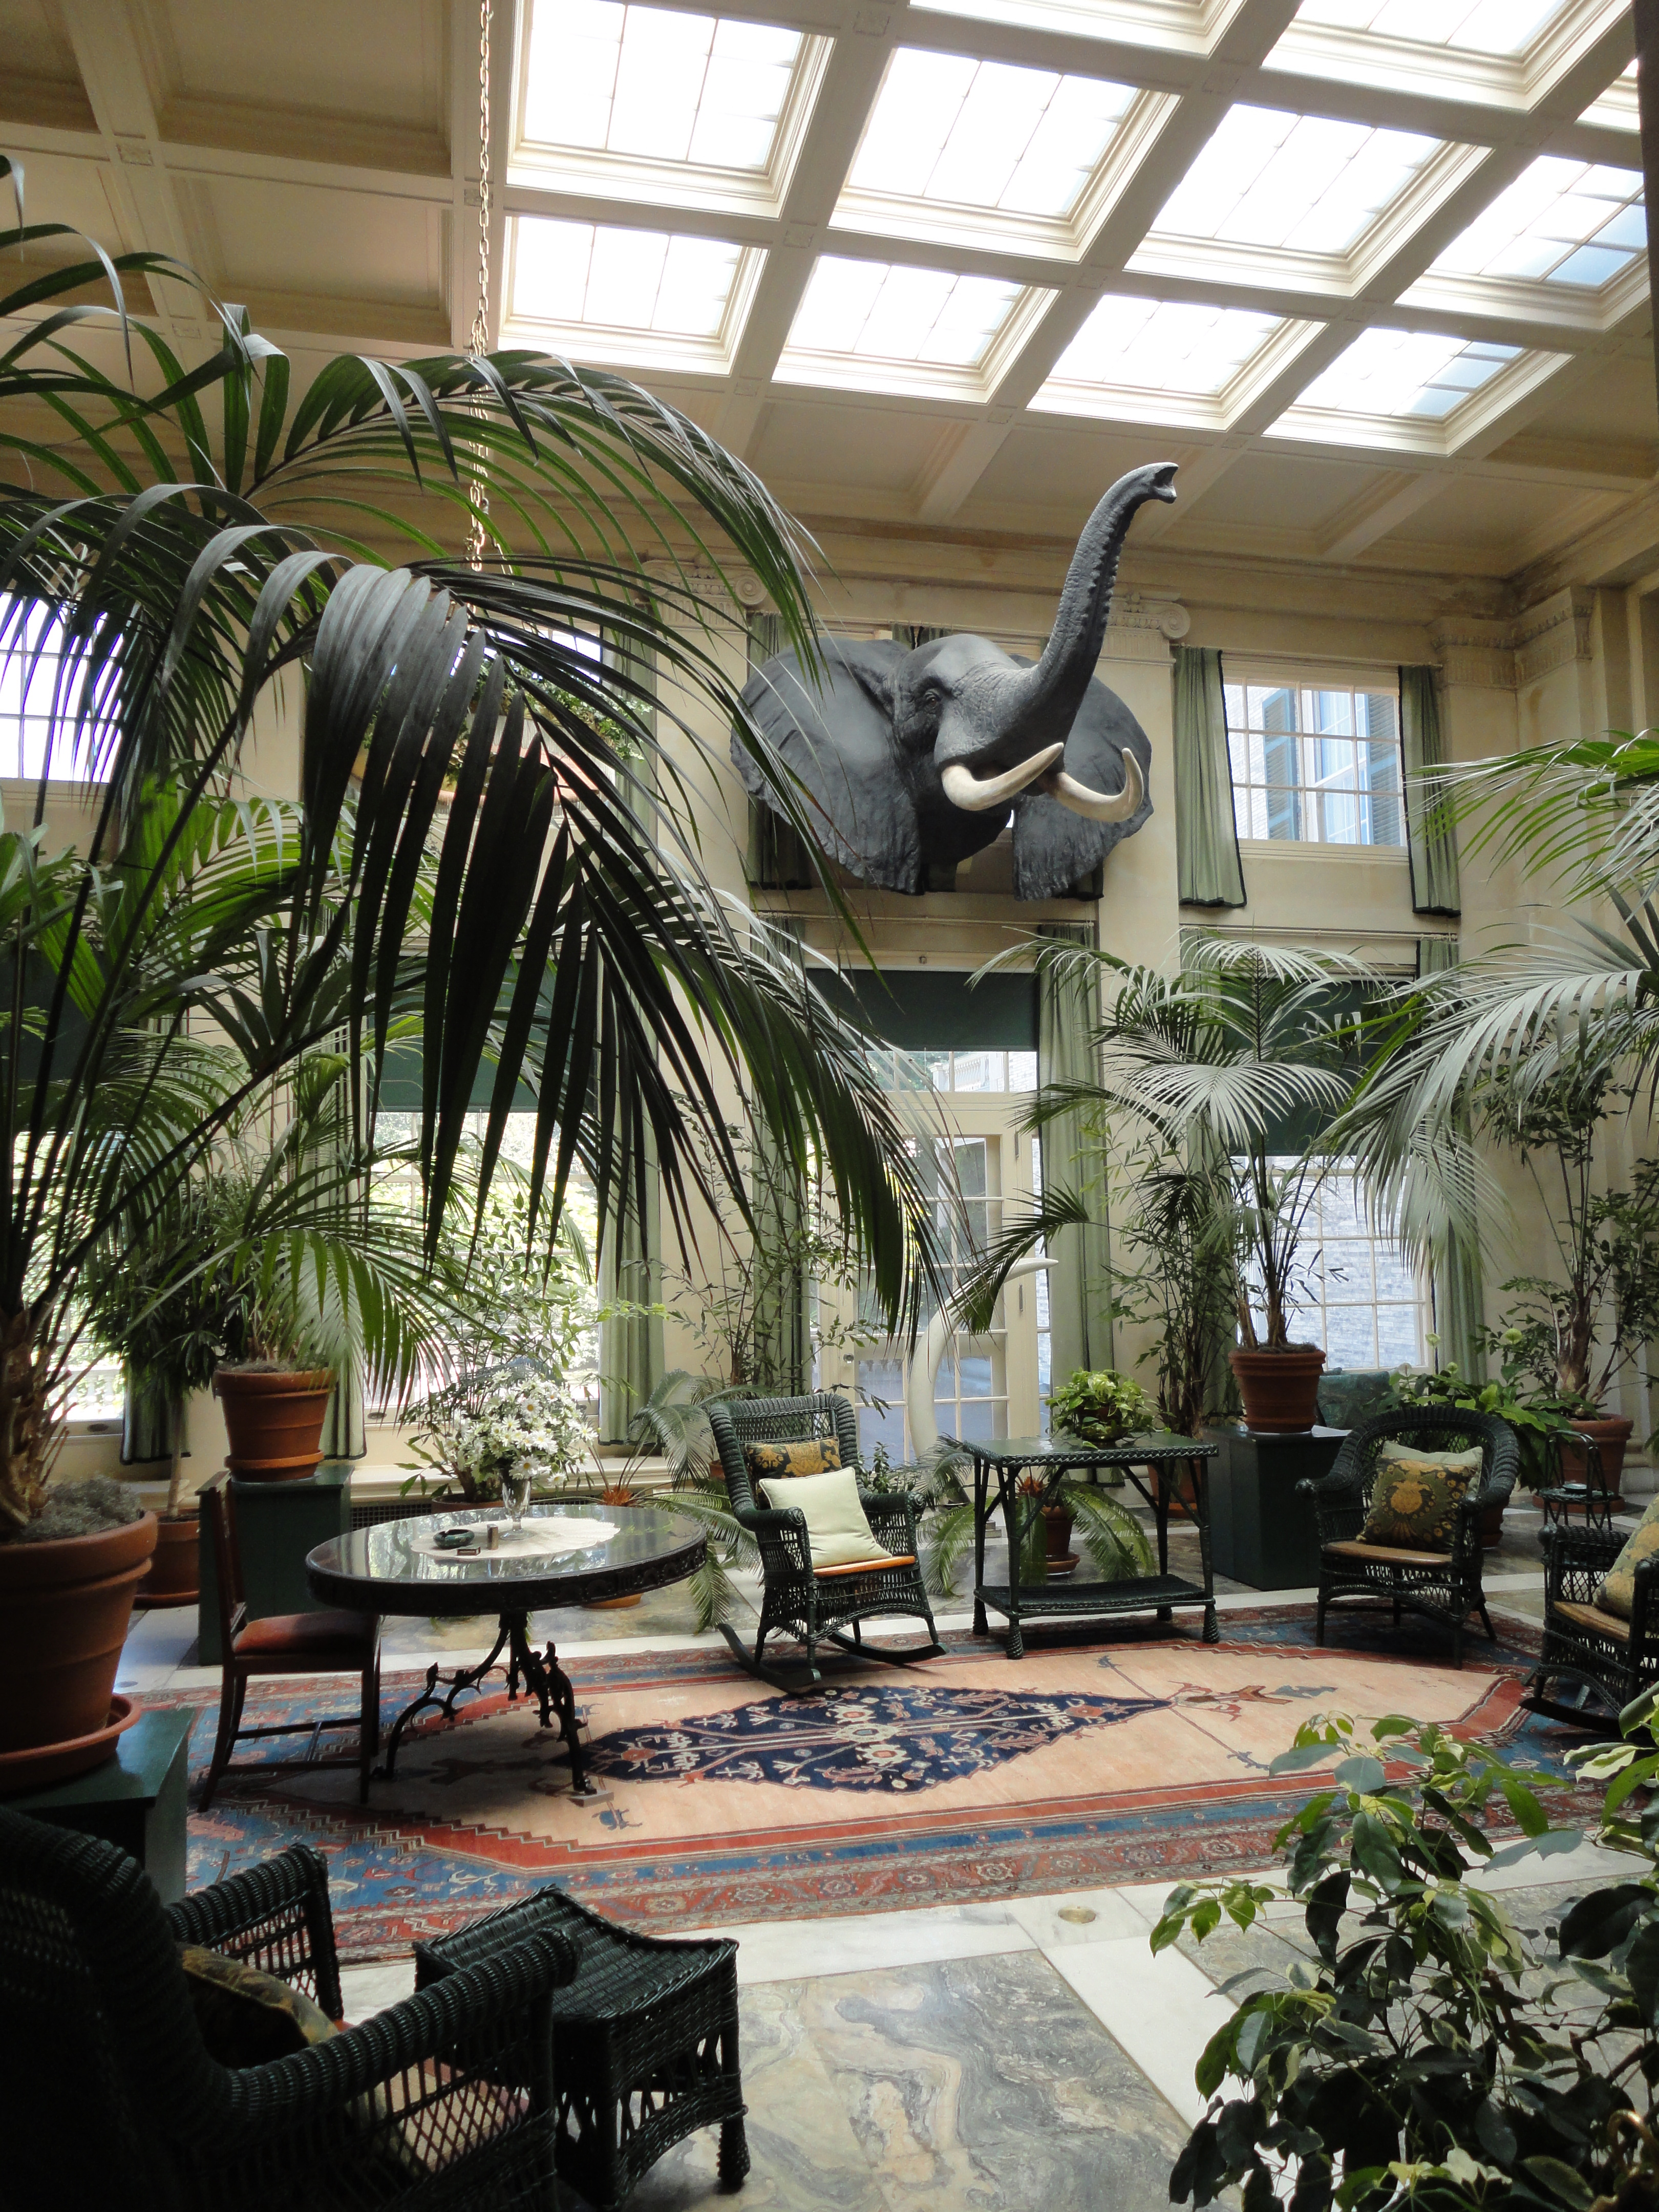 File:George Eastman House Interior